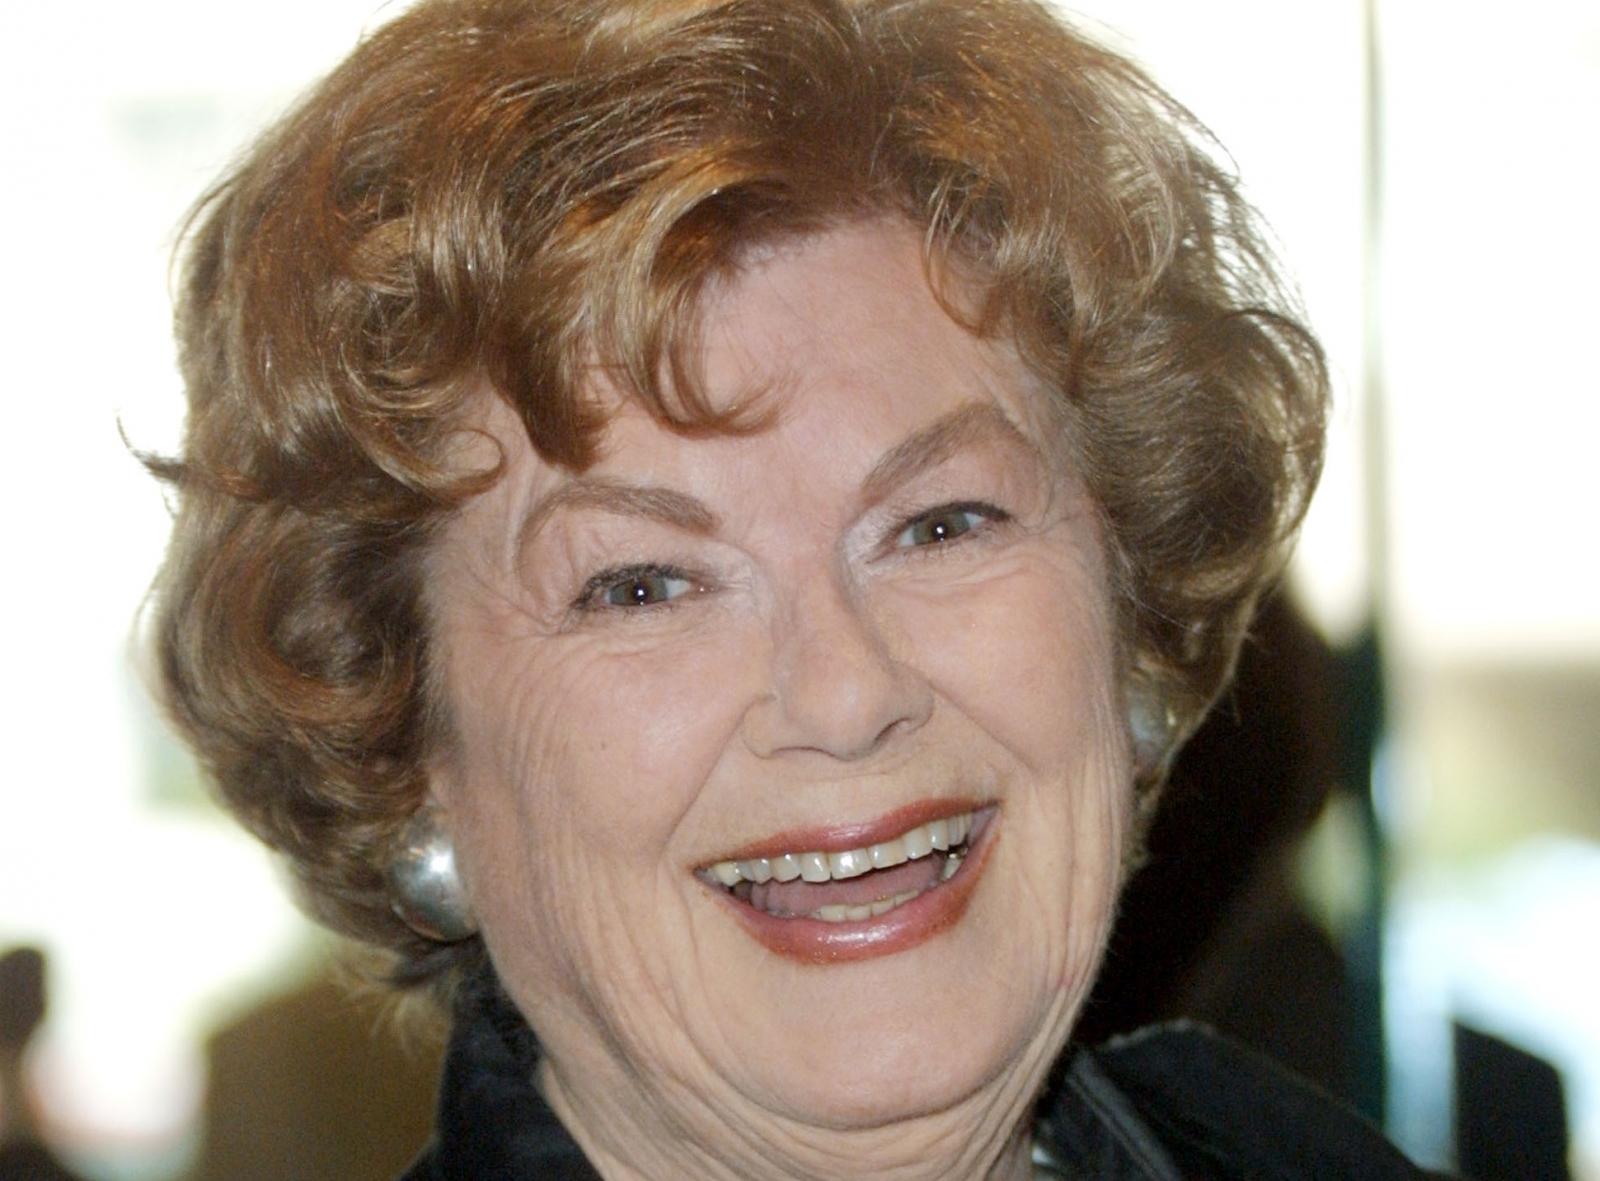 Perry Mason actress Barbara Hale